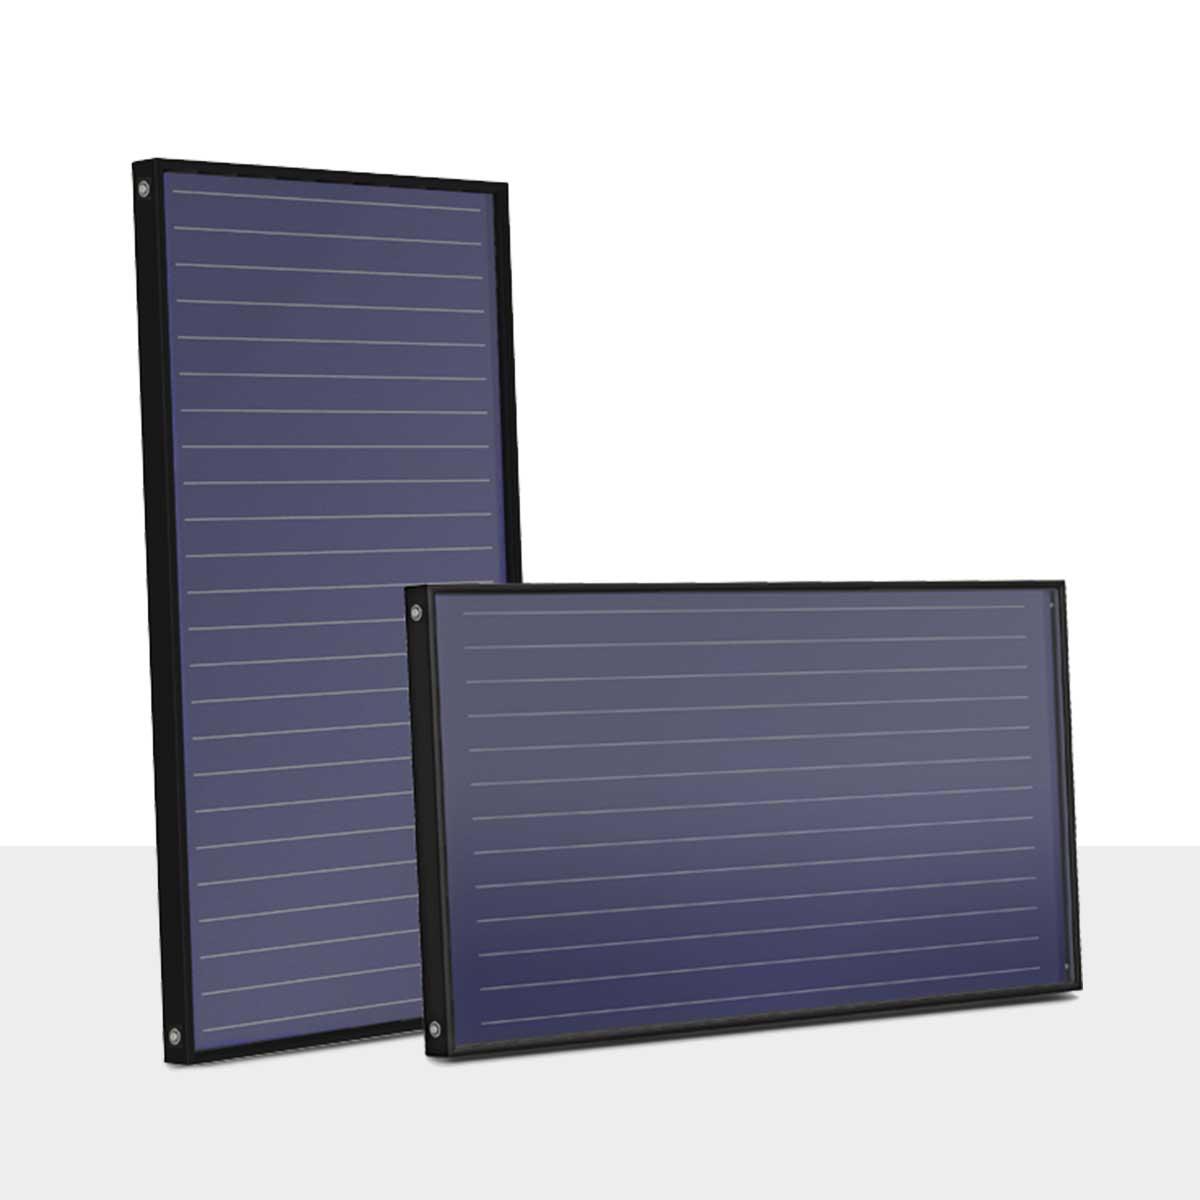 aluminiumkollektor premiumal solarkollektor. Black Bedroom Furniture Sets. Home Design Ideas